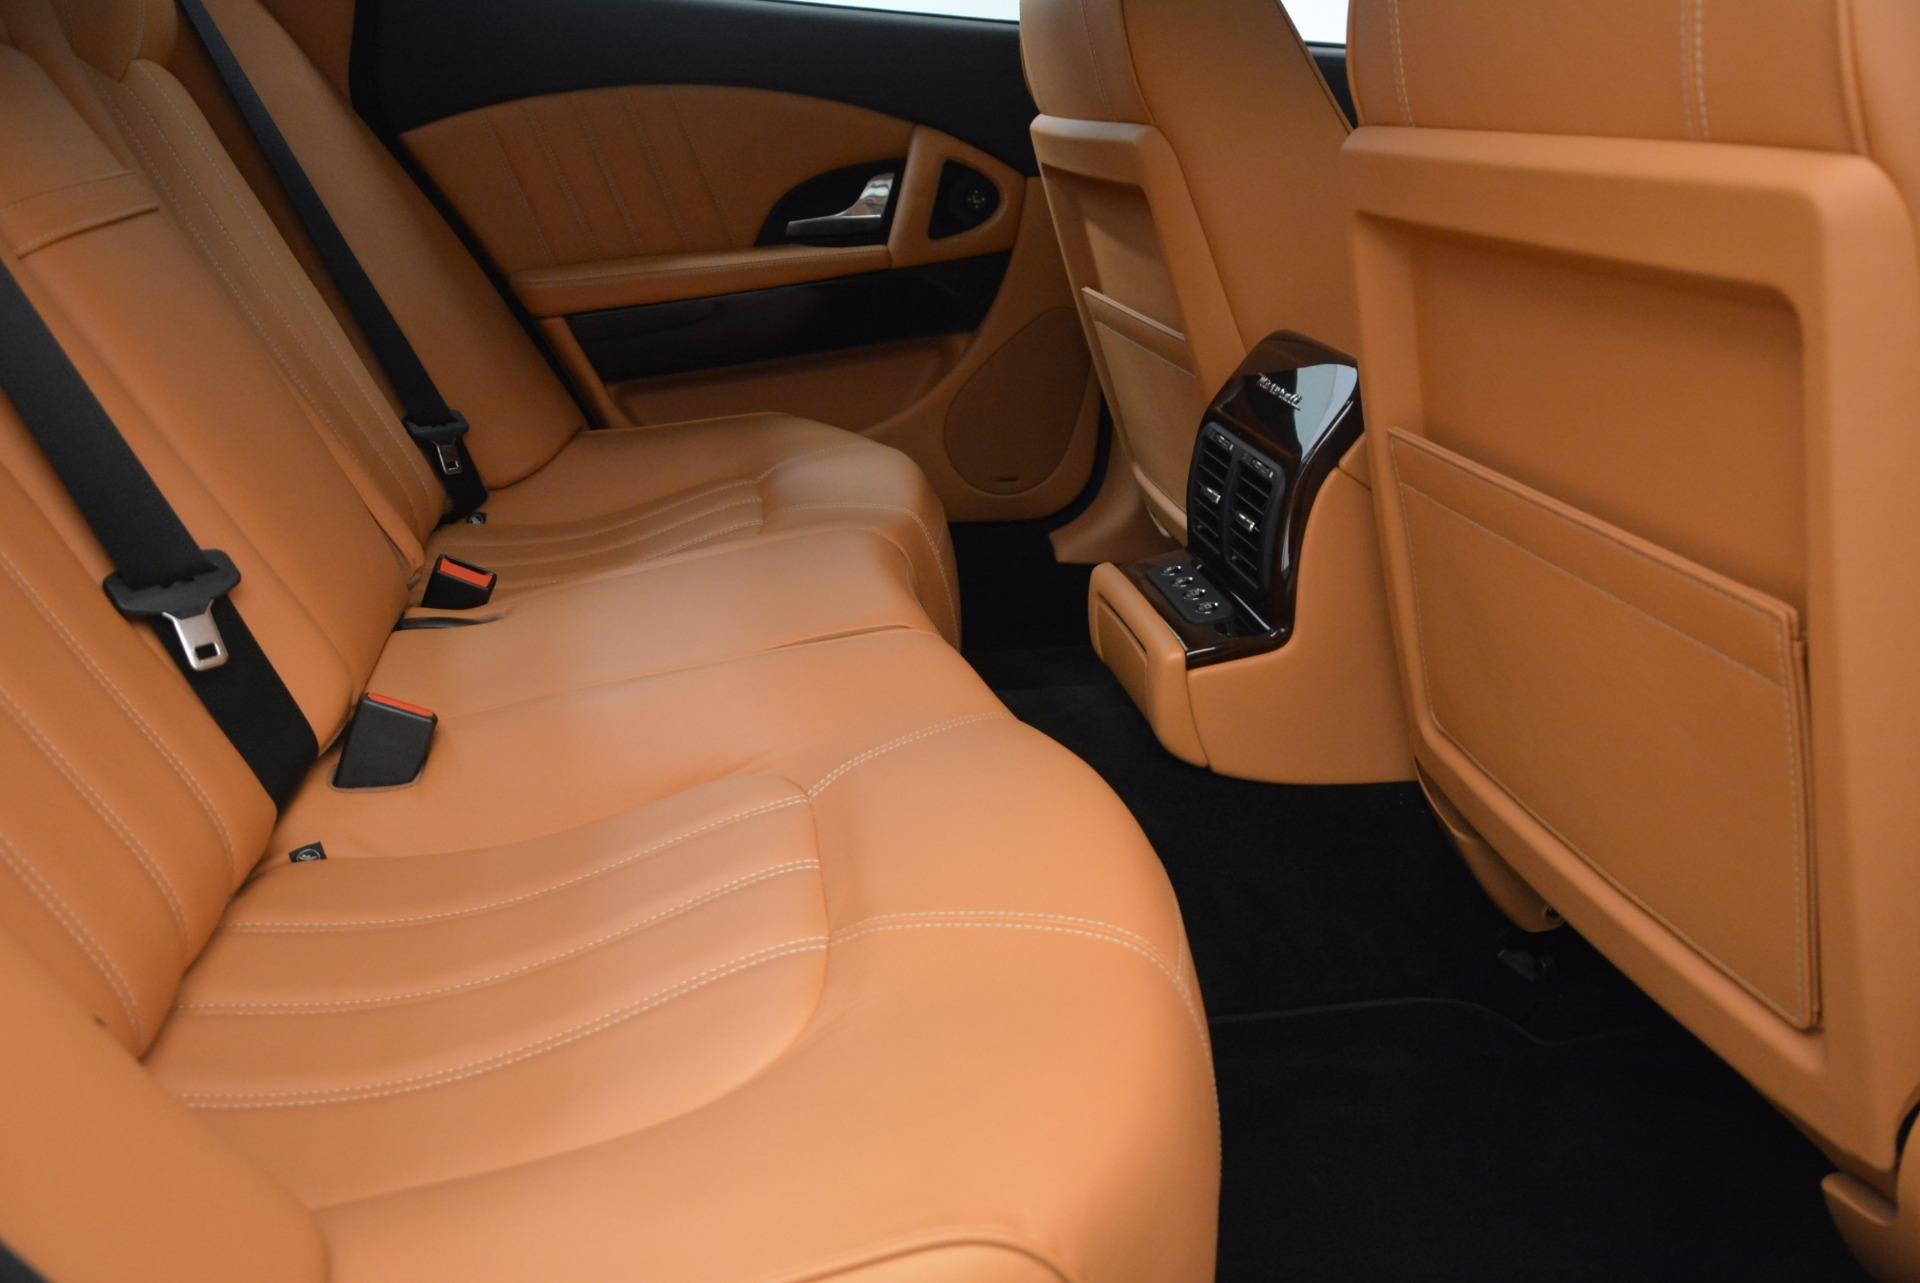 Used 2010 Maserati Quattroporte S For Sale In Westport, CT 1551_p38